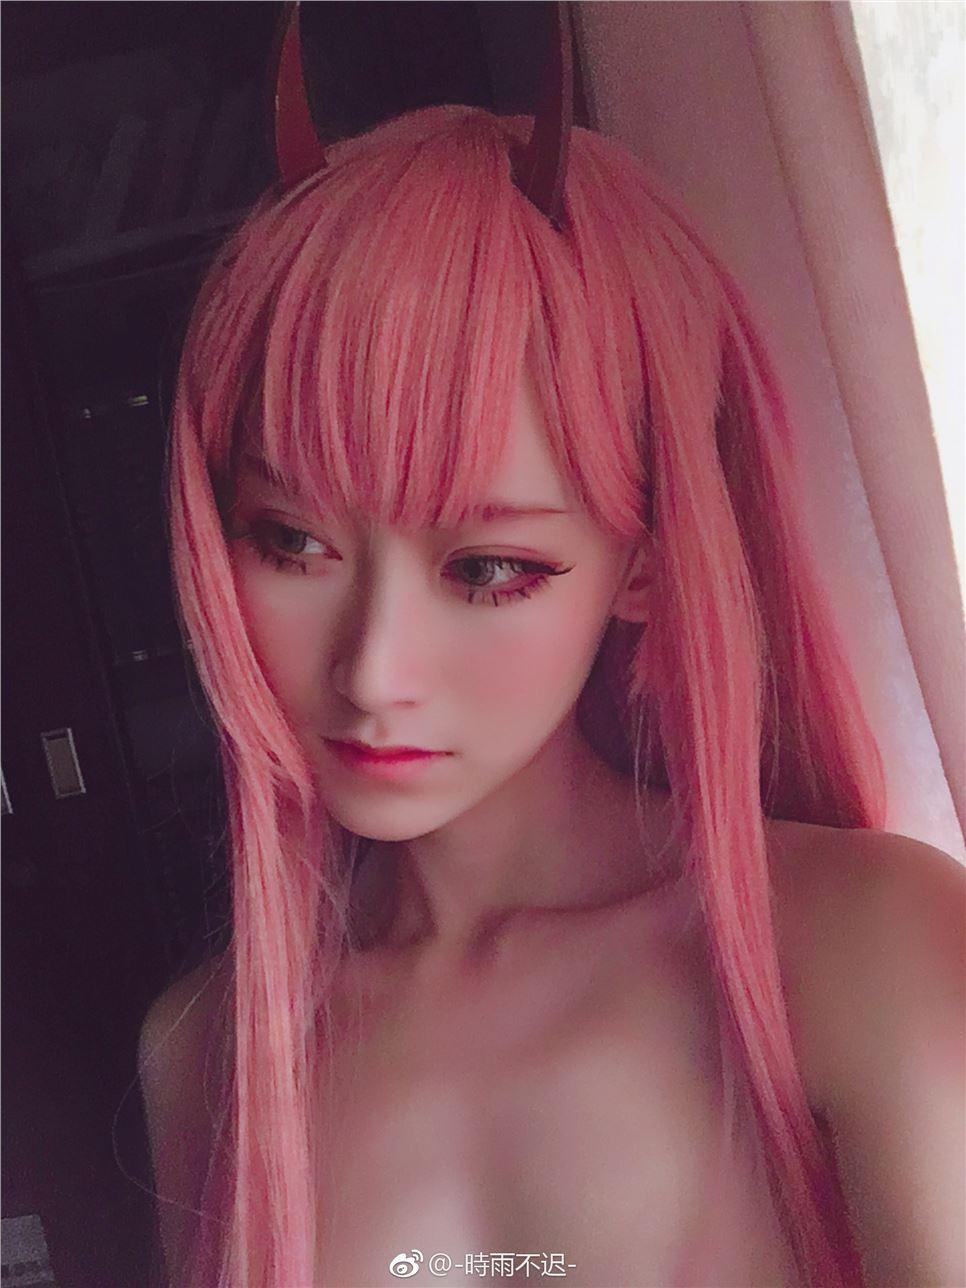 【cosplay】Zero Two Cosplay -时雨不迟-【acgloc】